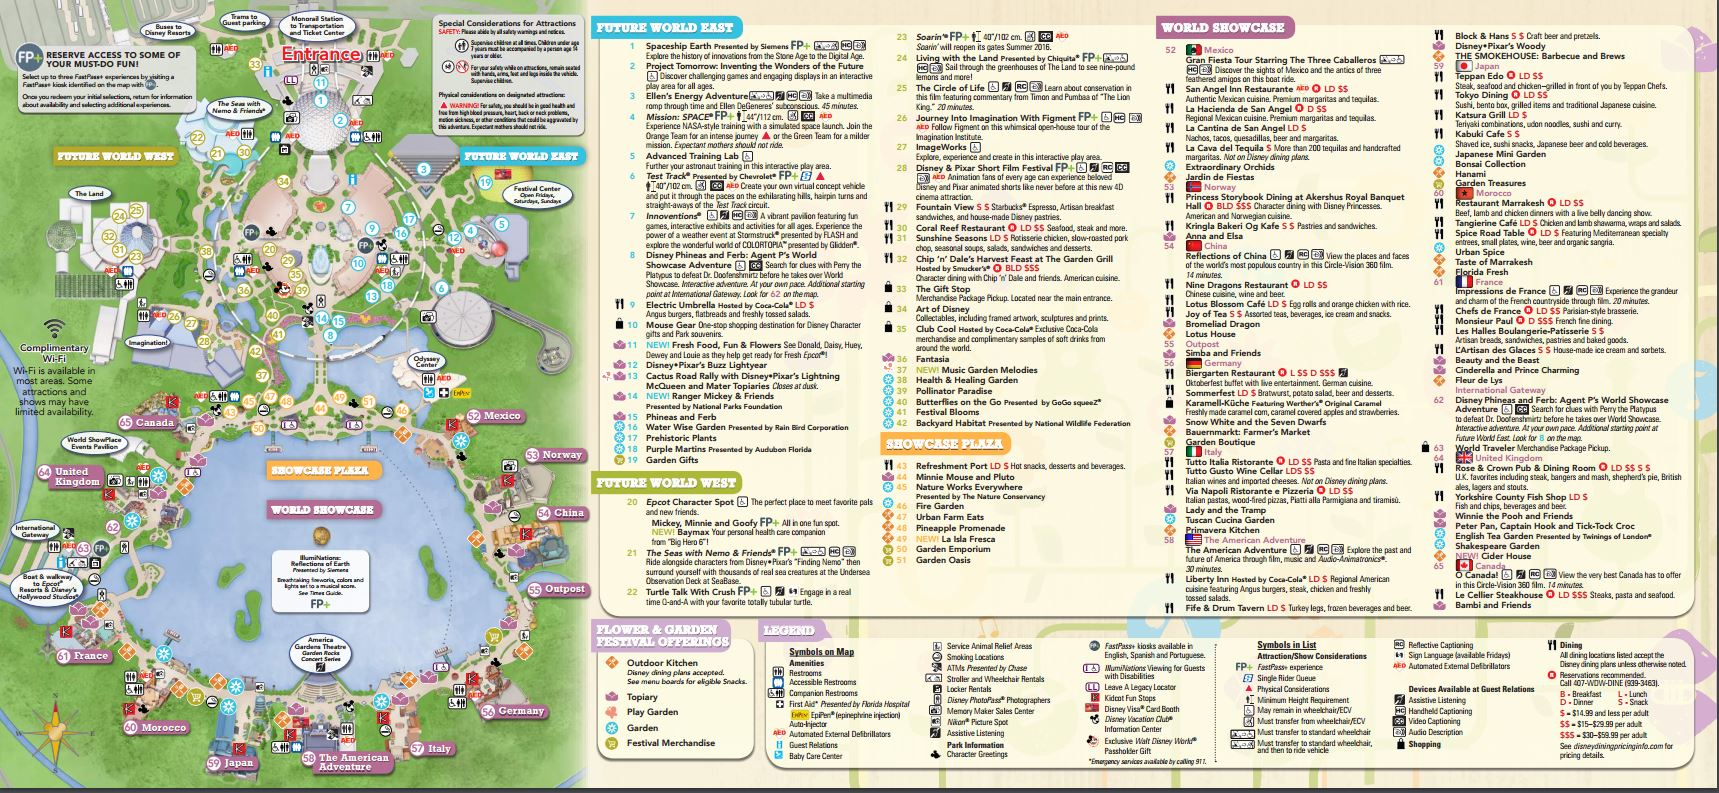 epcot map 2017 pdf - photo #4